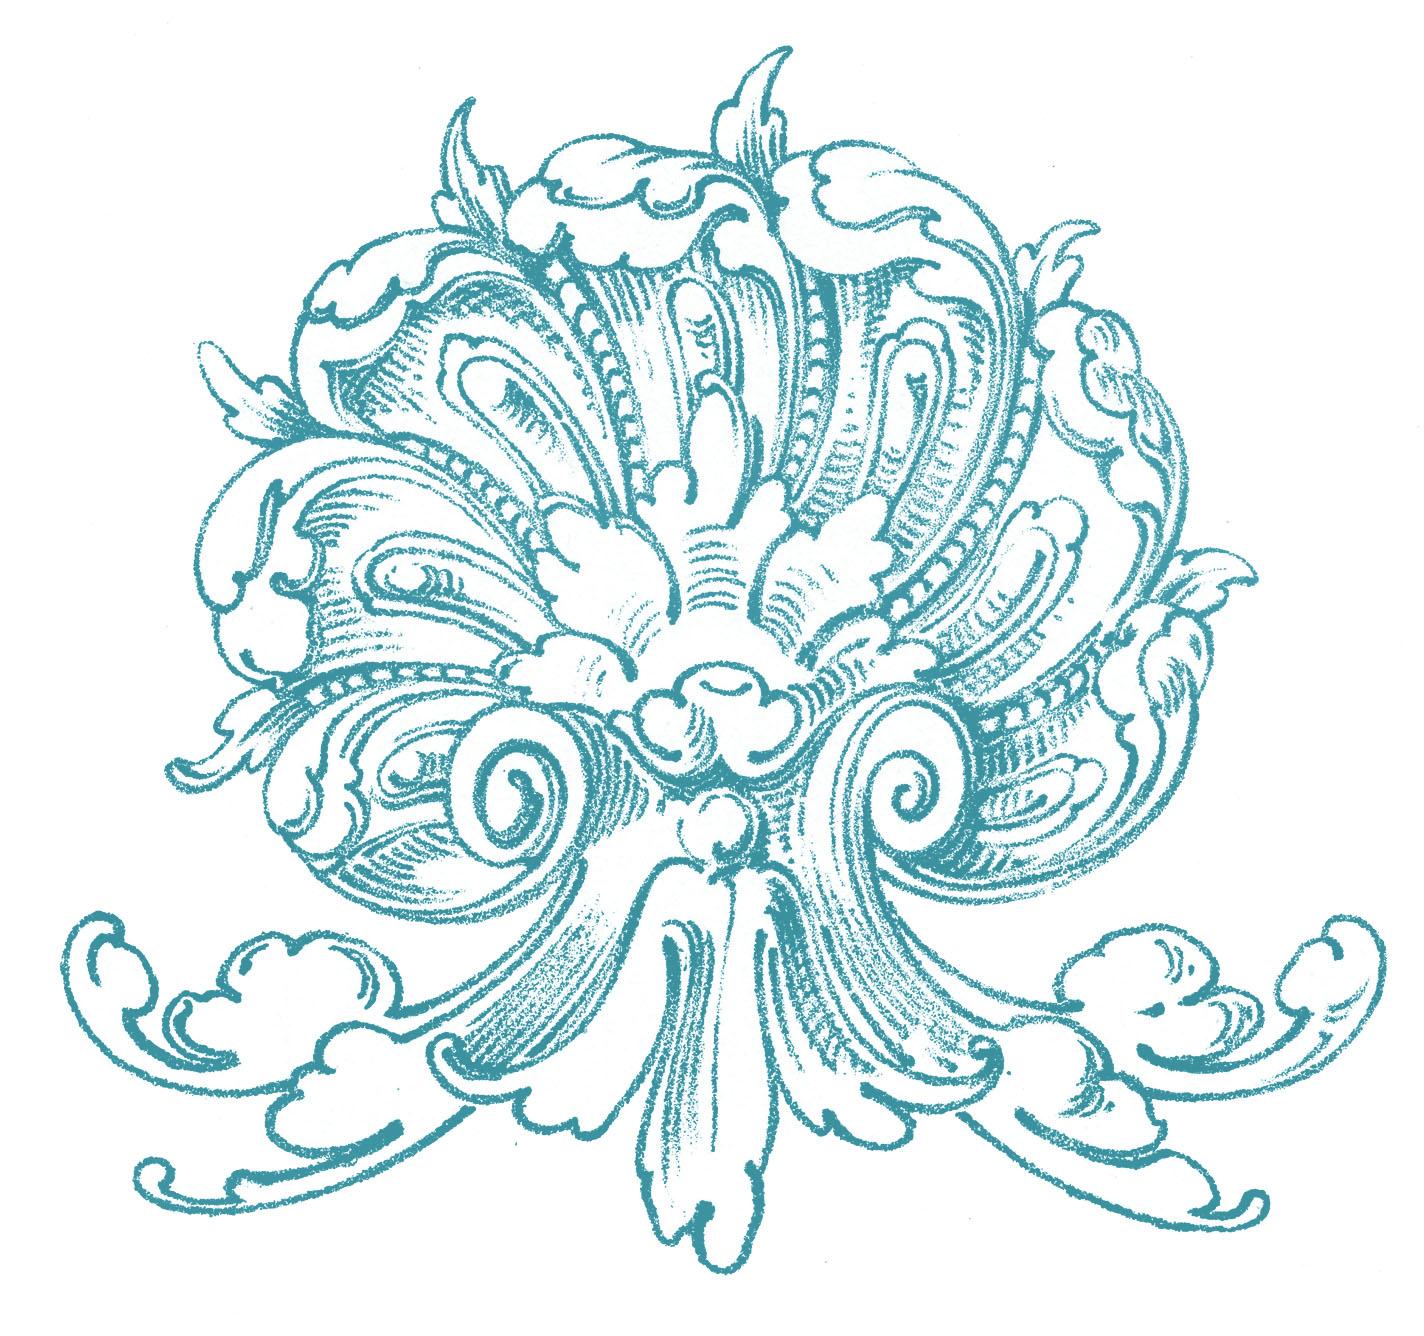 http://4.bp.blogspot.com/-7xl-7Pm1OzQ/UBK9ZldiEiI/AAAAAAAATAg/HRpEu_TzCko/s1600/Ornament-Shell-GraphicsFairyblu.jpg